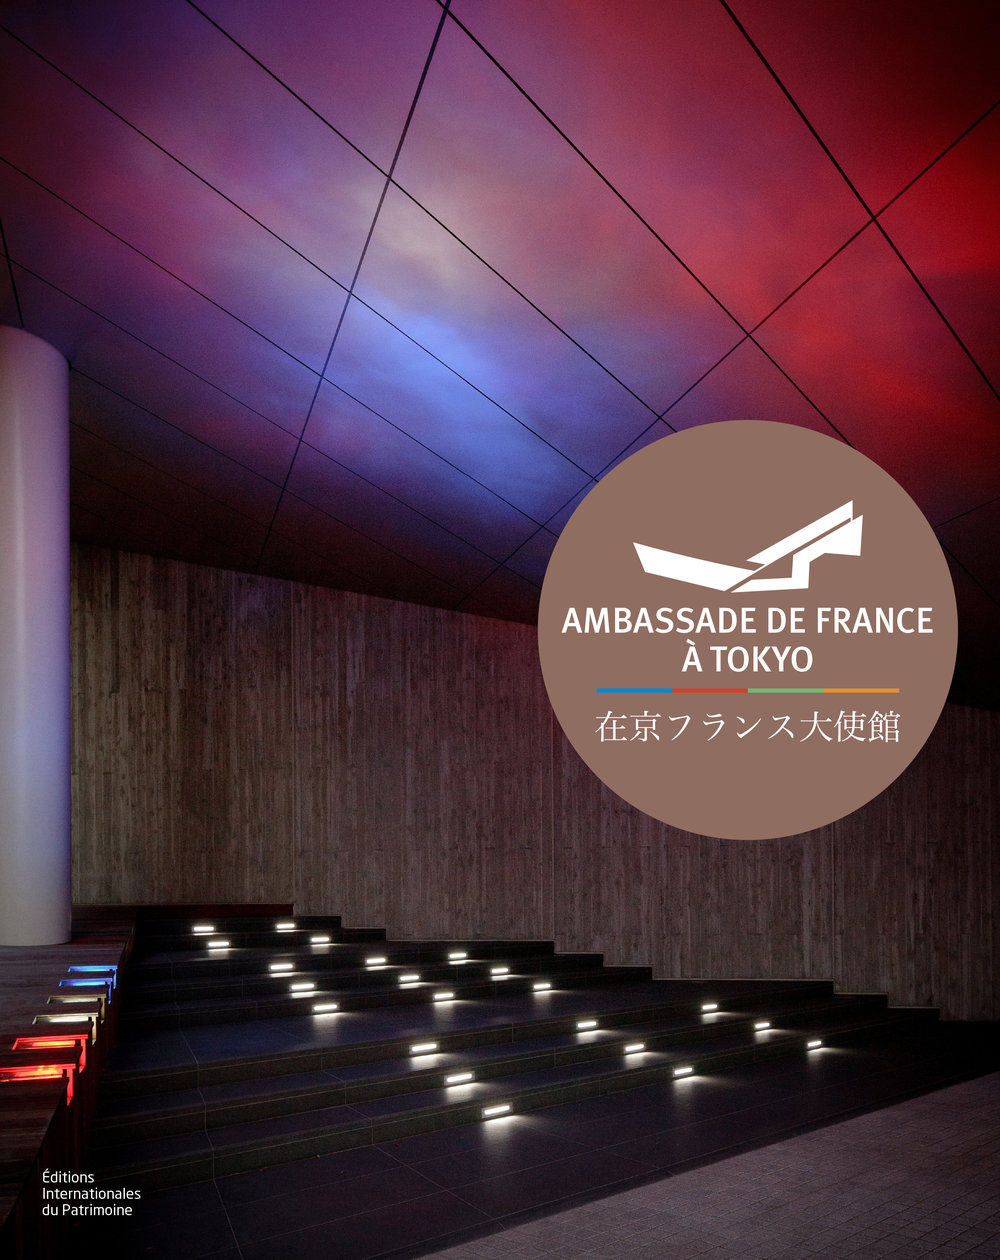 Ambassade de FranceTokyo - Corporate Book Design for French Ministry of Foreign AffairsClient: French Ministry of Foreign Affairsand Éditions Internationales de Patrimoine